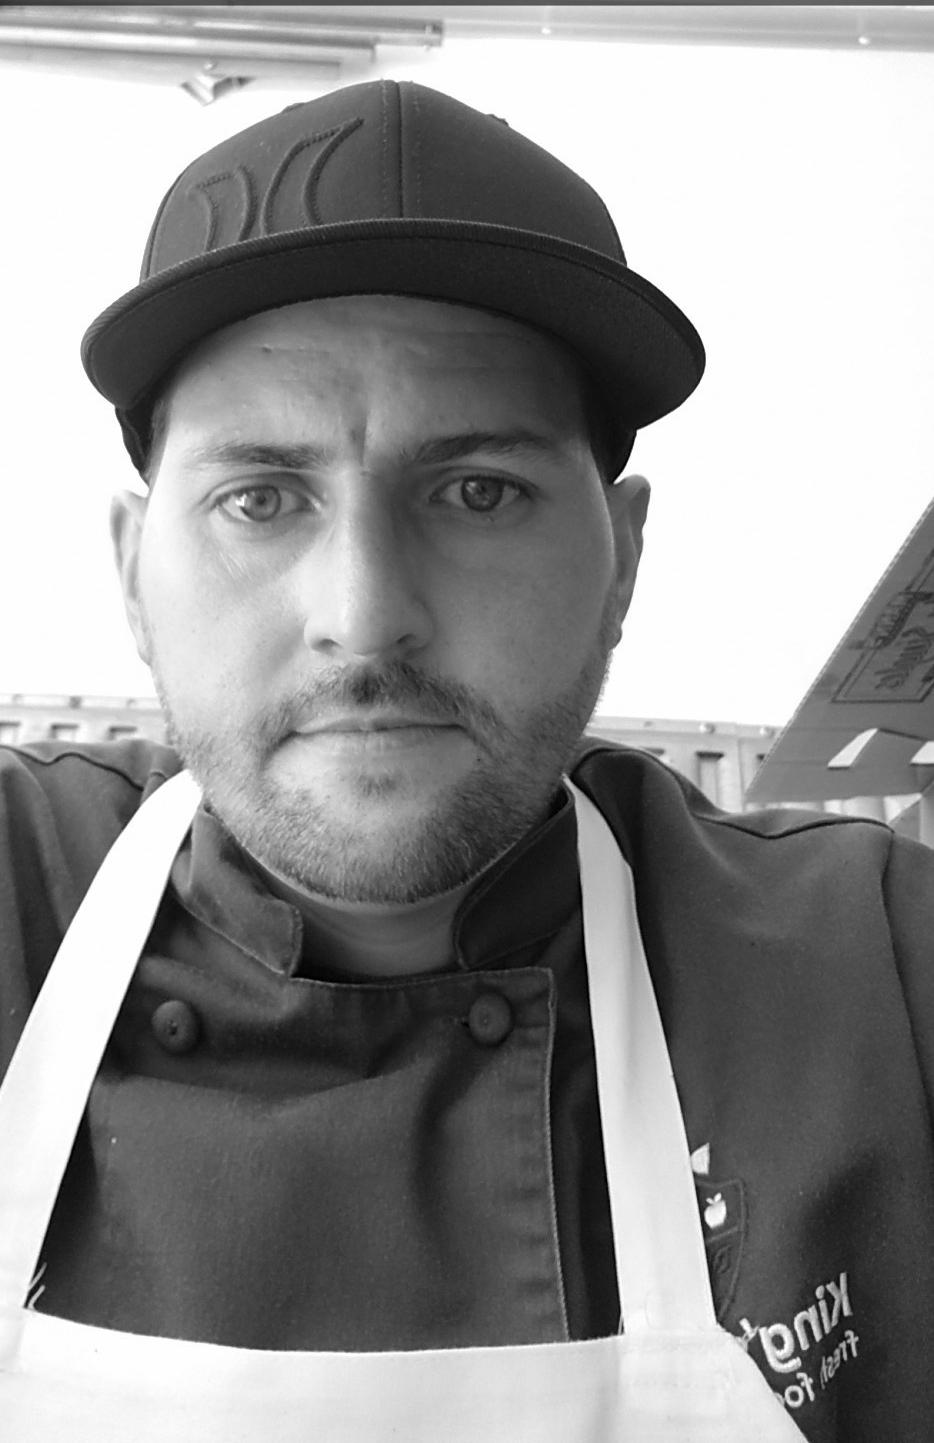 chefcox570 on One Bite Pizza App